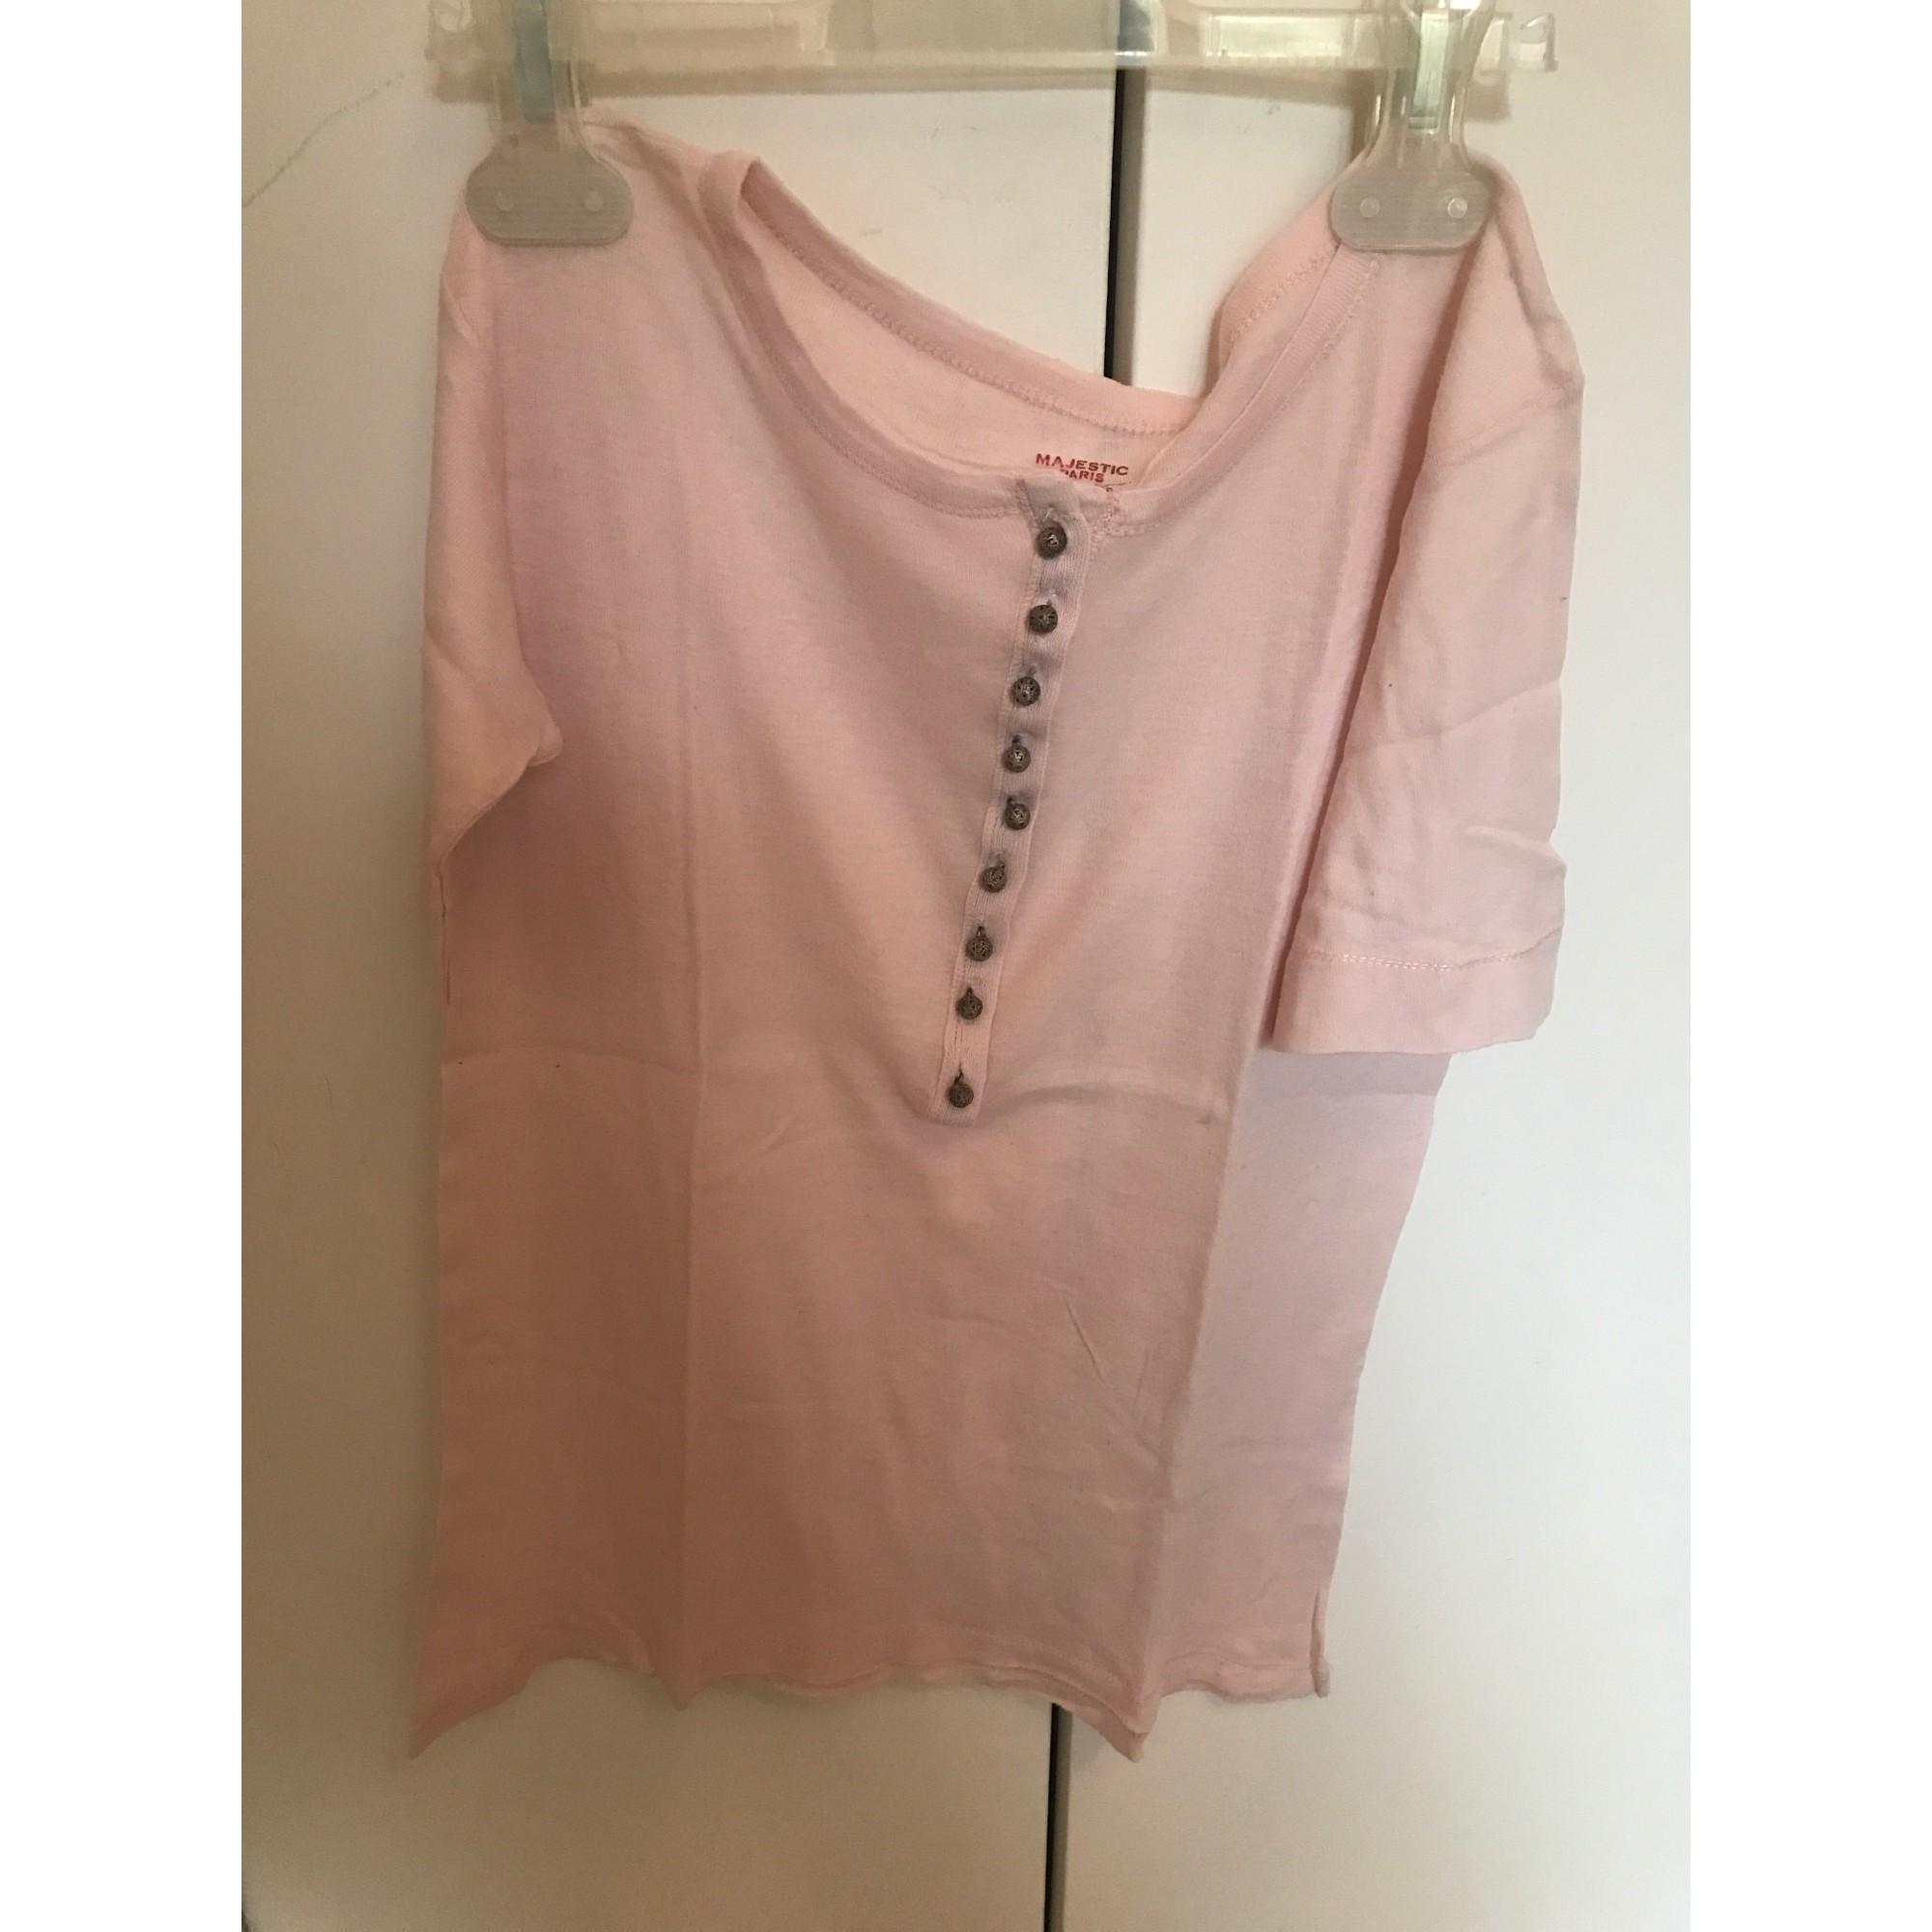 Top, tee-shirt MAJESTIC Rose, fuschia, vieux rose